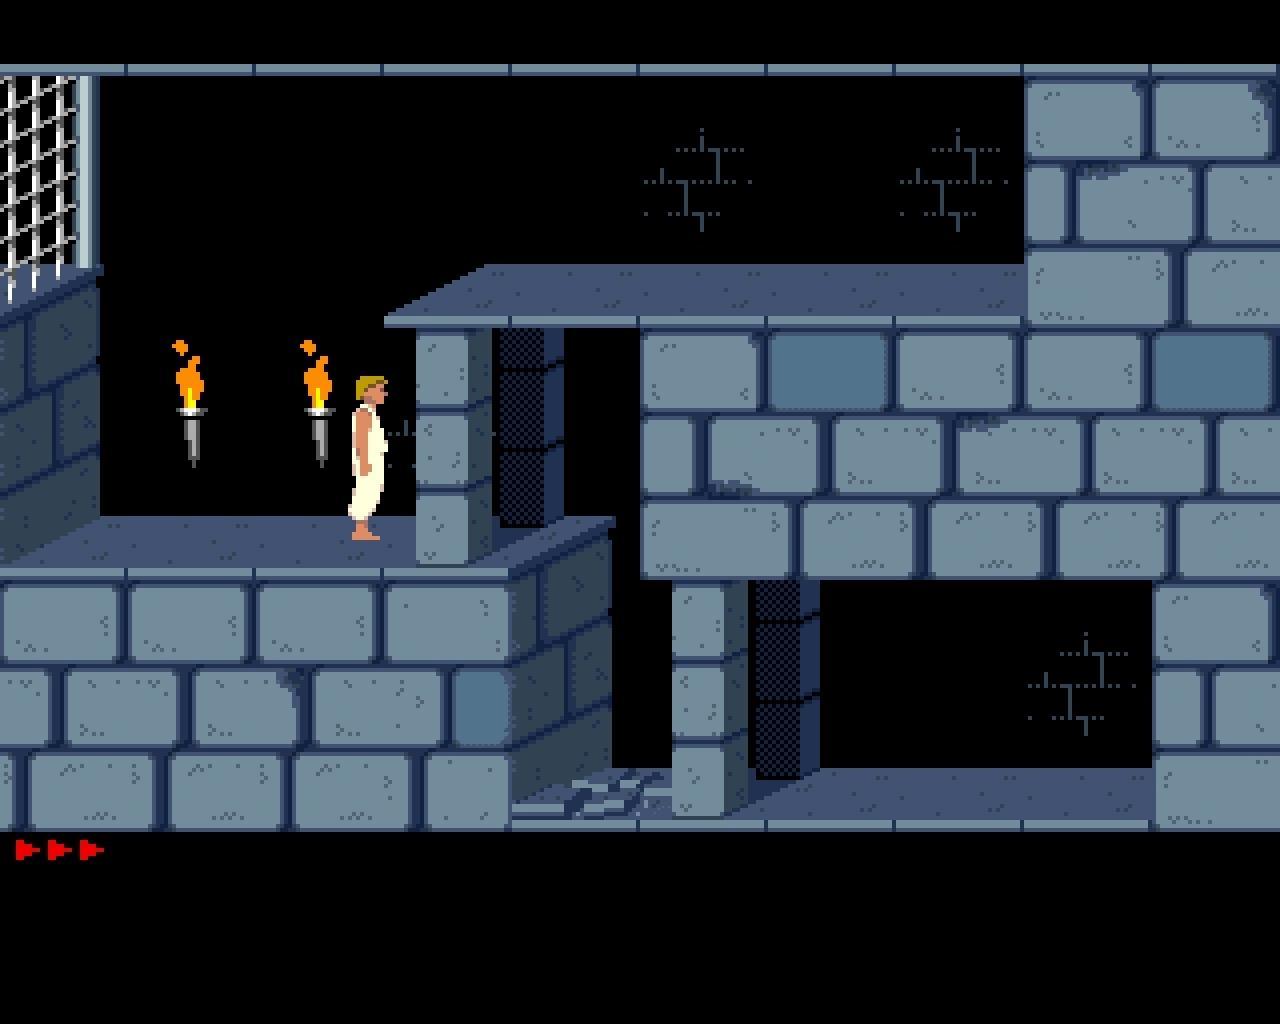 Prince_of_Persia_-_Amiga_-_Ingame__1990_.JPG